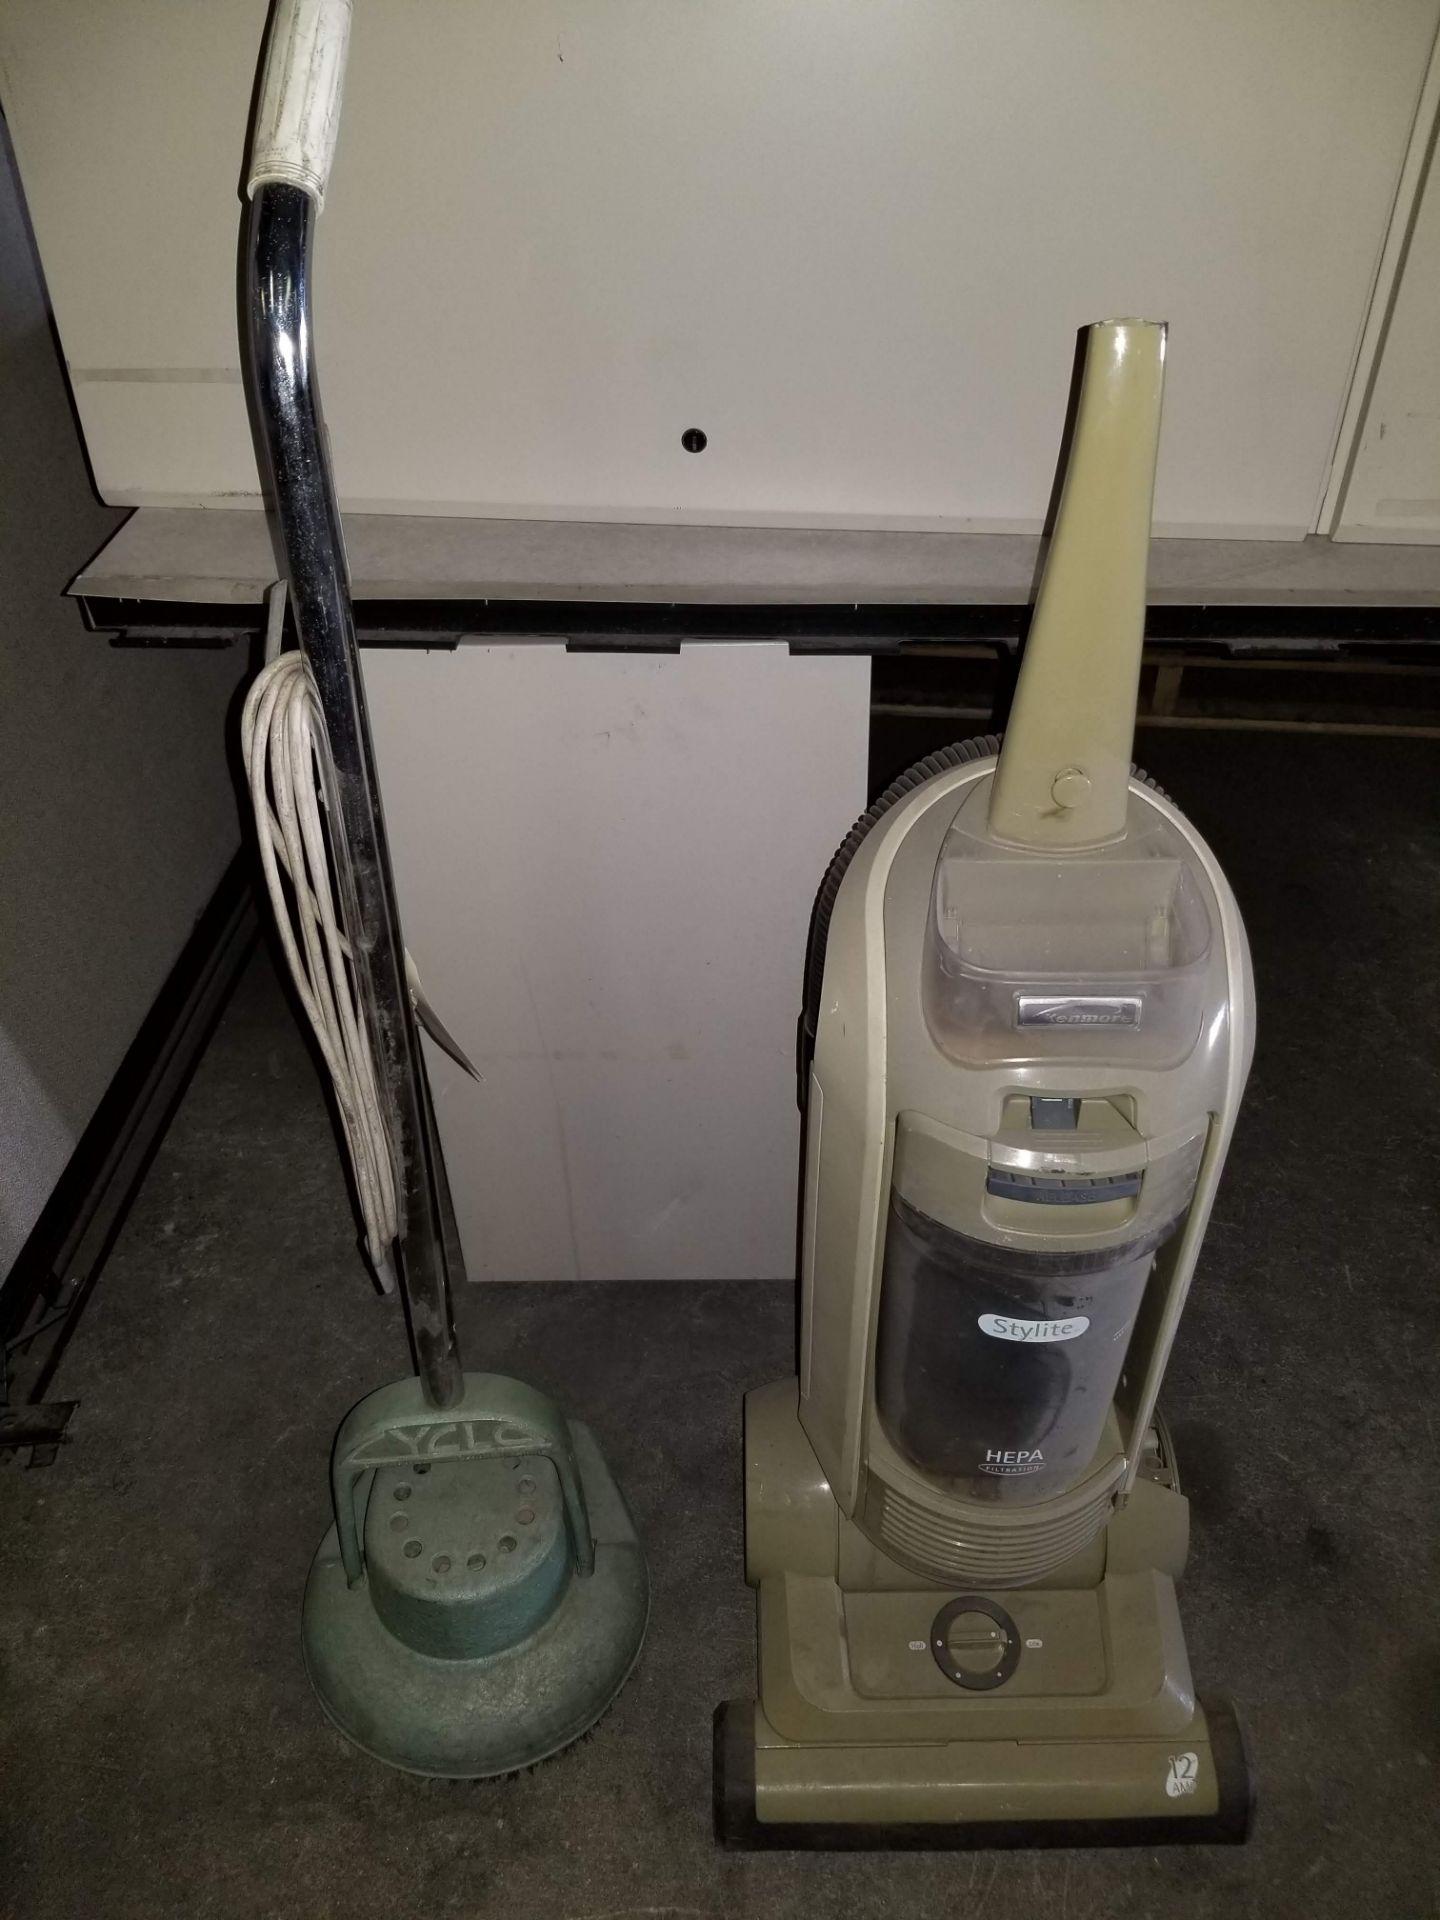 Lot 46 - Cyclo HD Floor Machine, Model # 350, 115V & Kenmore Stylite Hepa Filtration Vacuum Cleaner